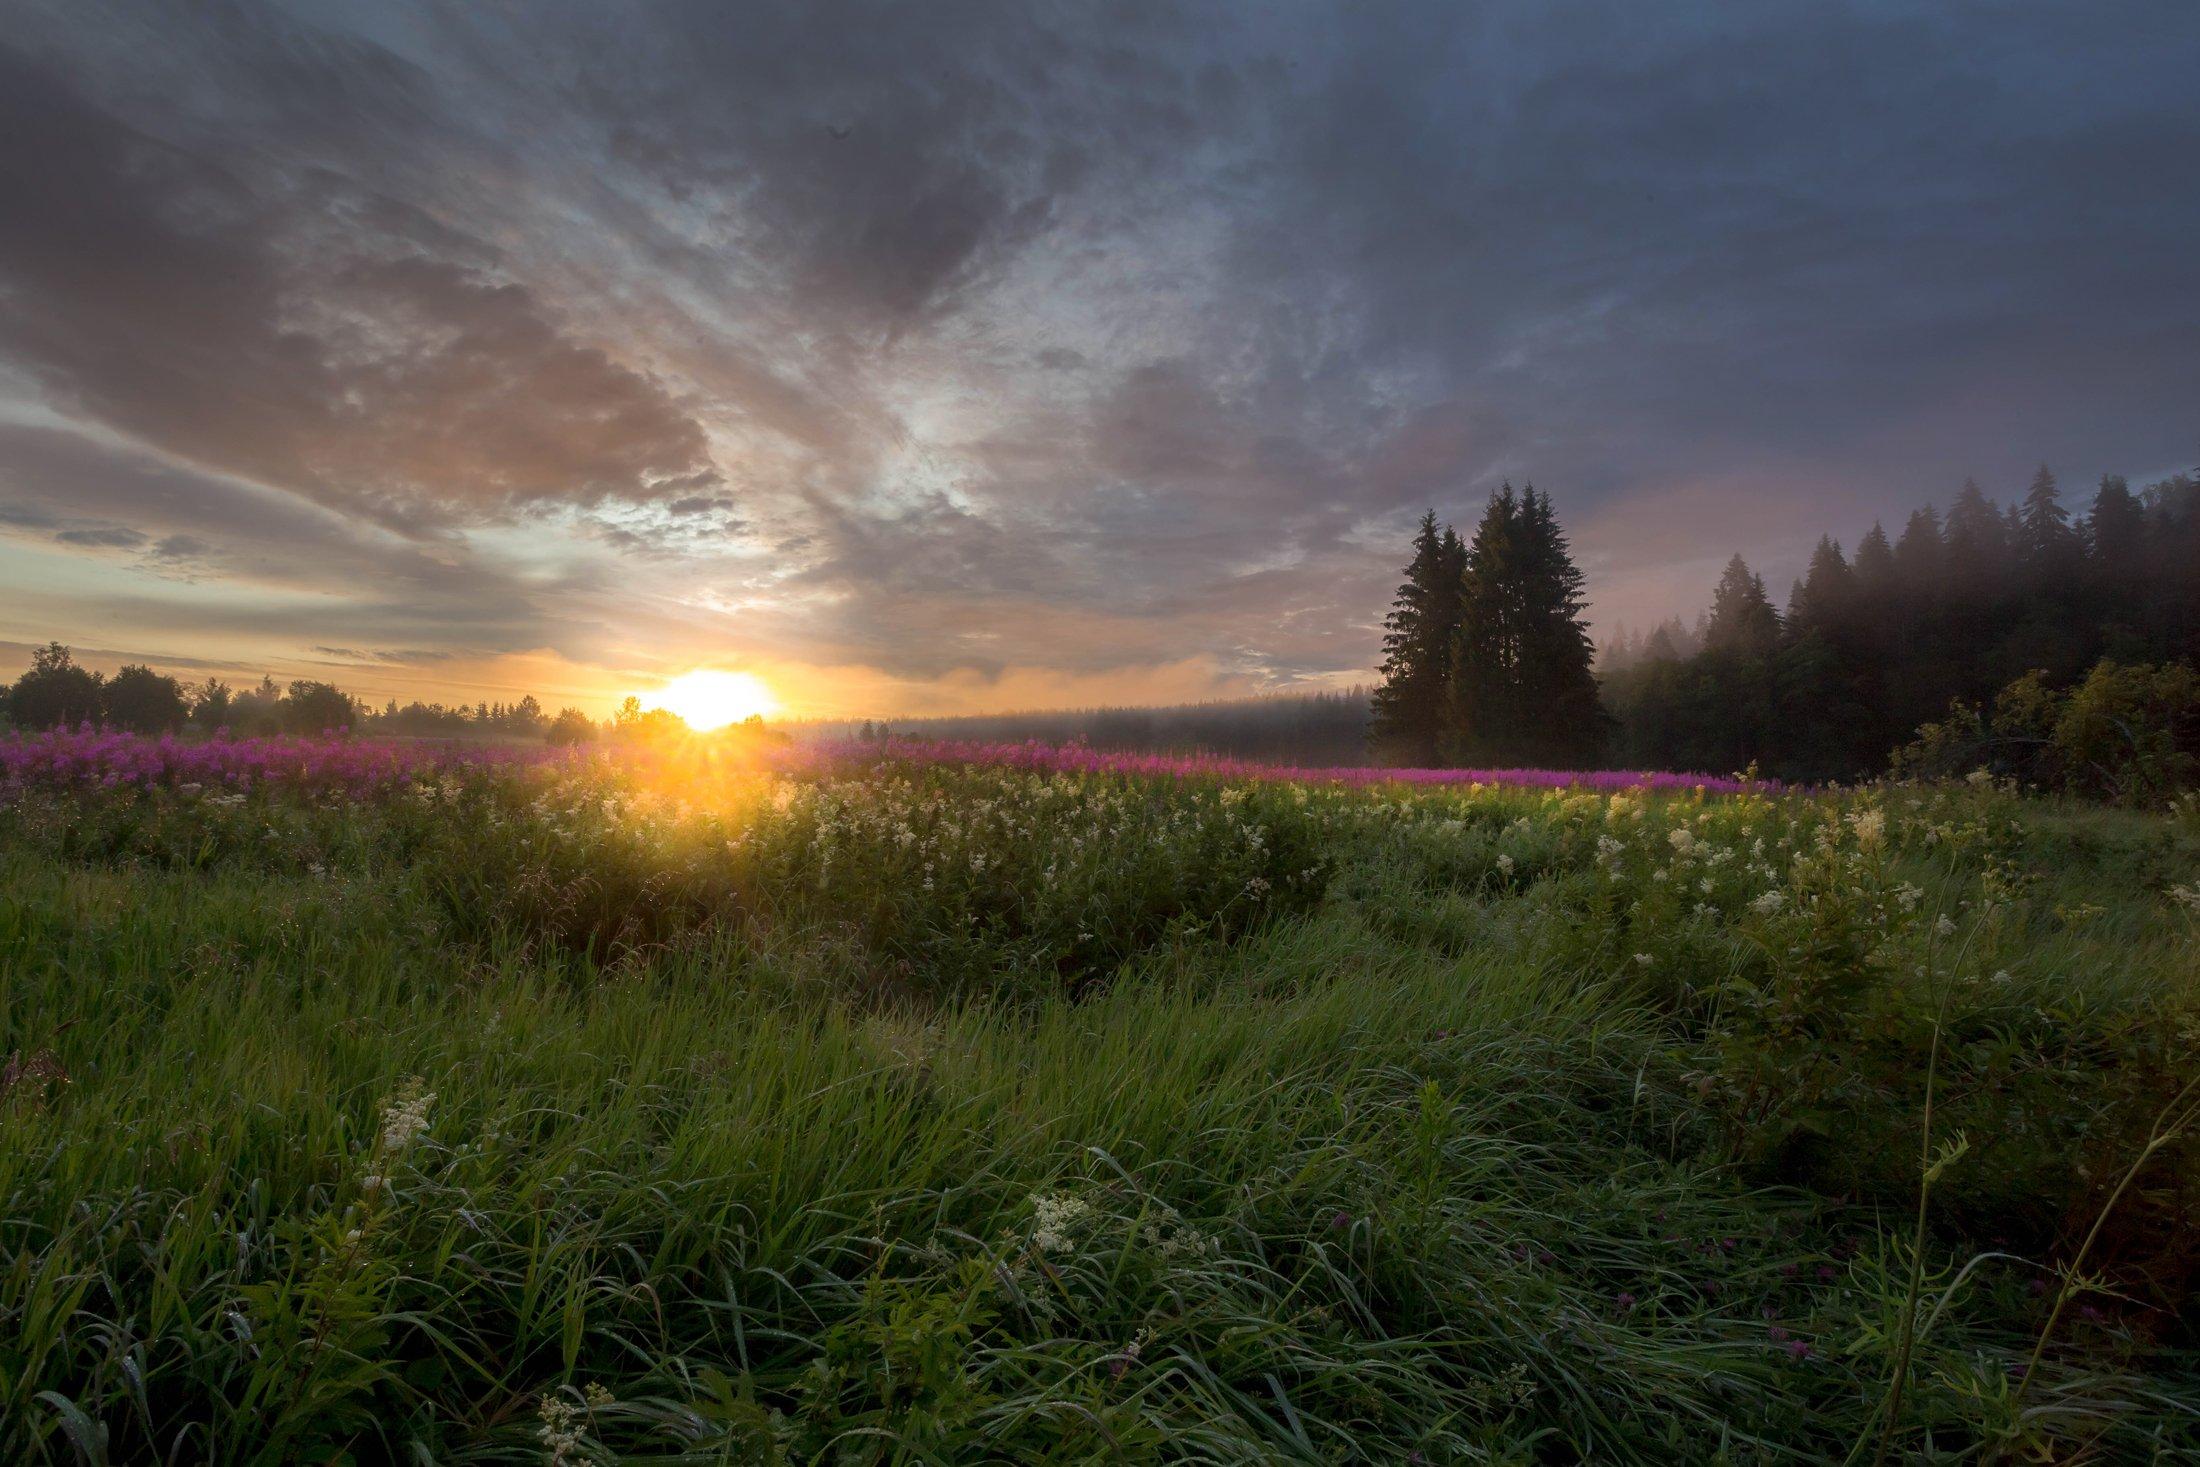 кипрей, лето, туман , поле, луг, рассвет ,карелия, Vaschenkov Pavel